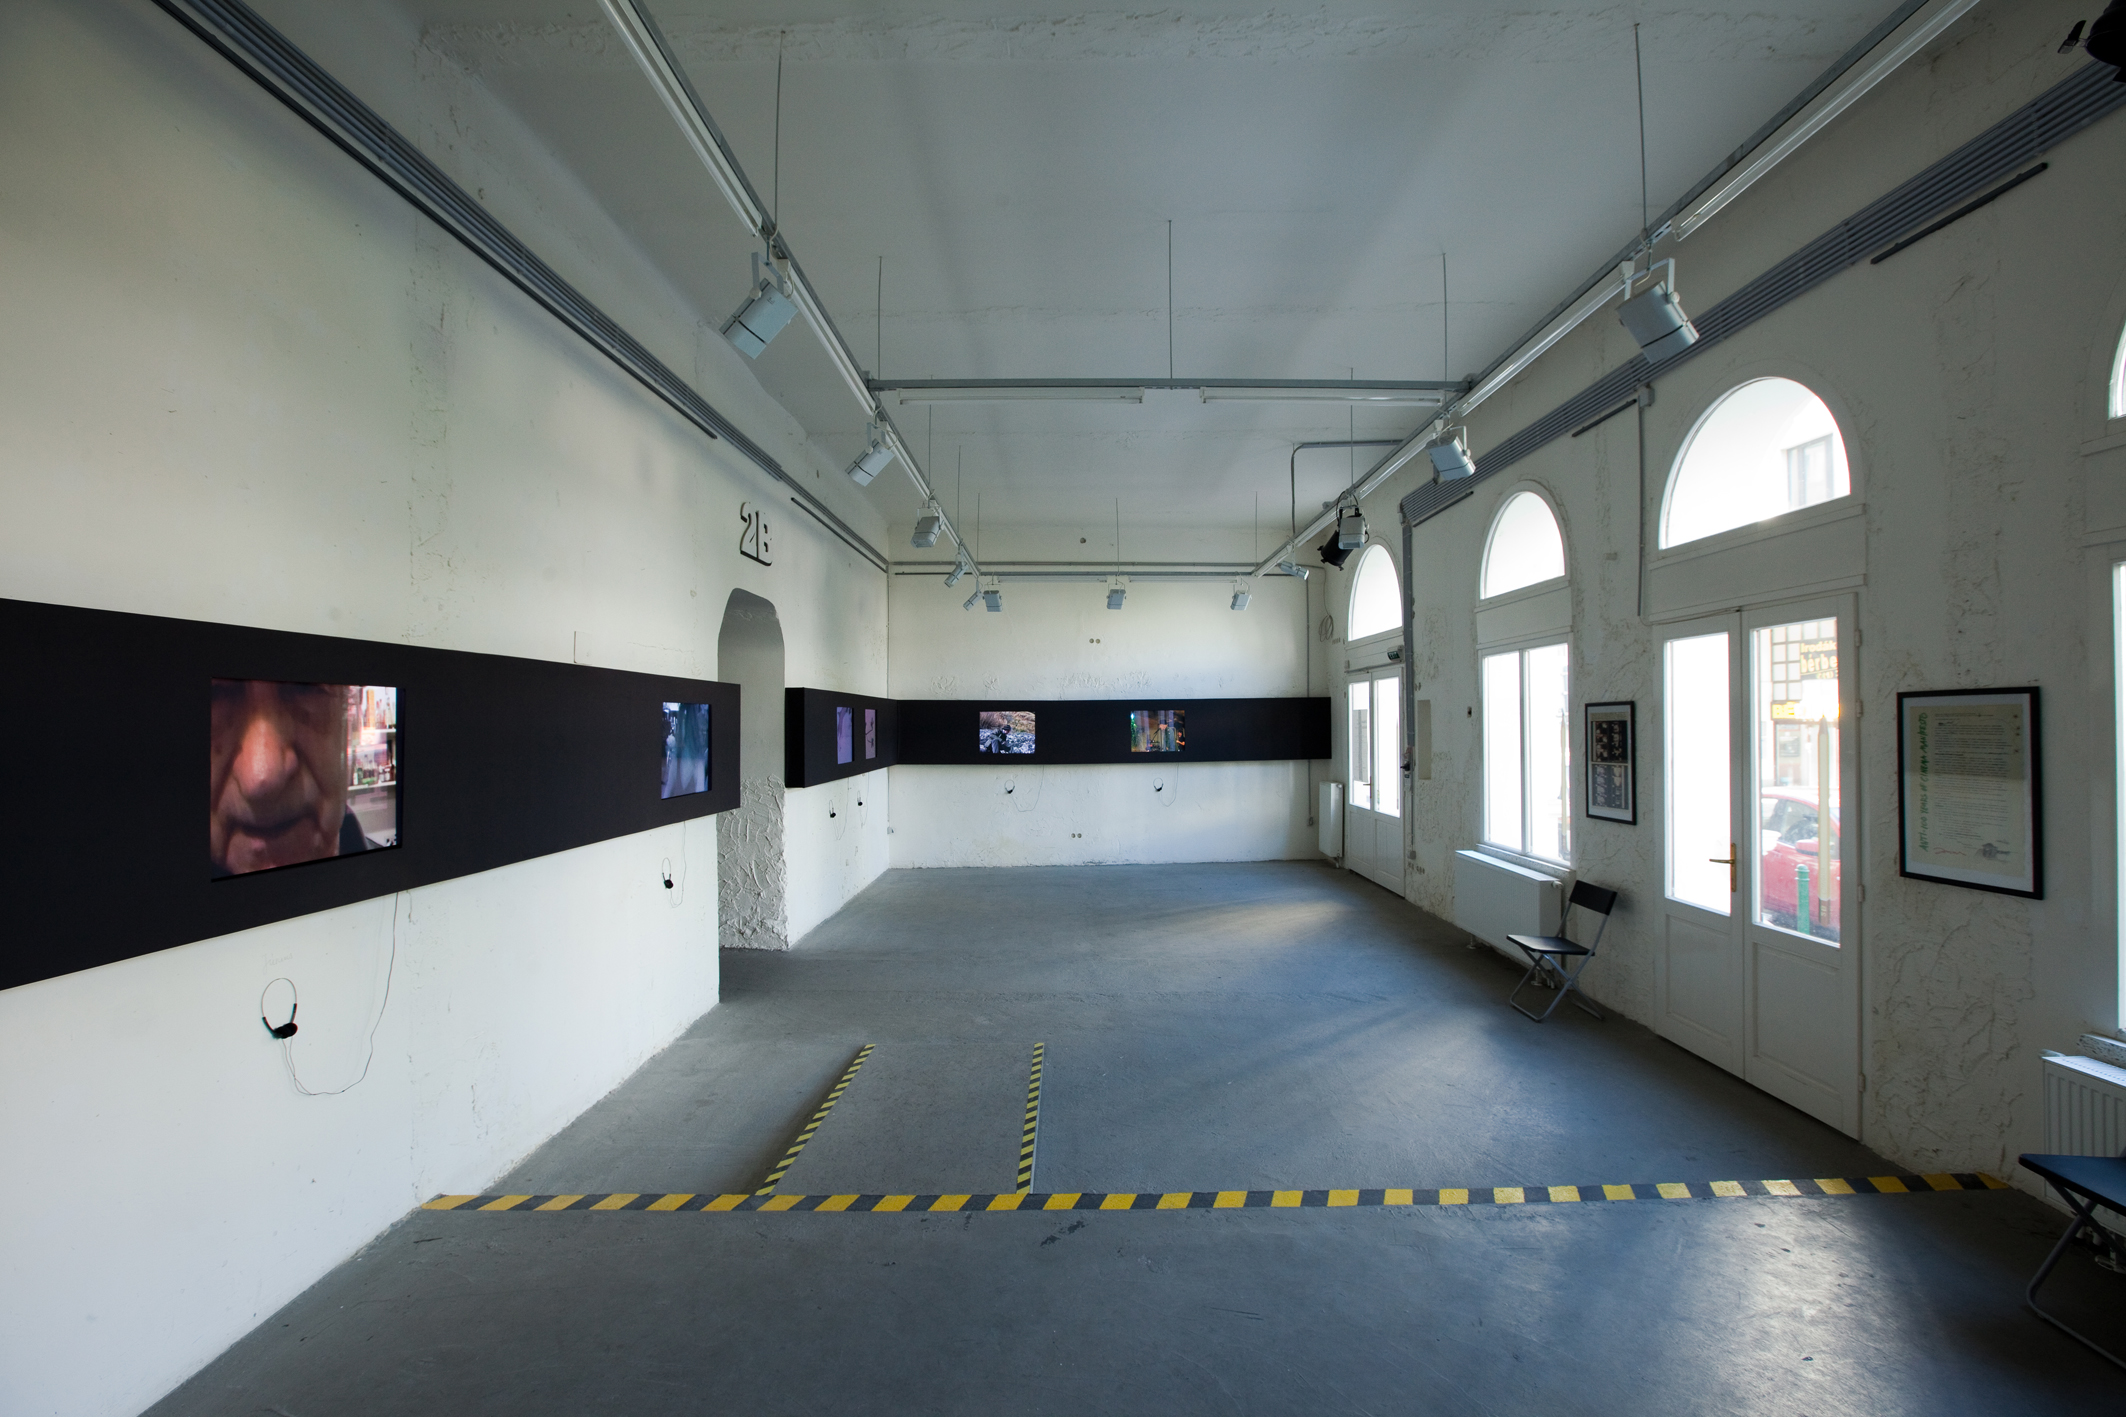 Jonas Mekas - 365 Day Project, 2B Gallery, BudapestJune 8 - July 6, 2012